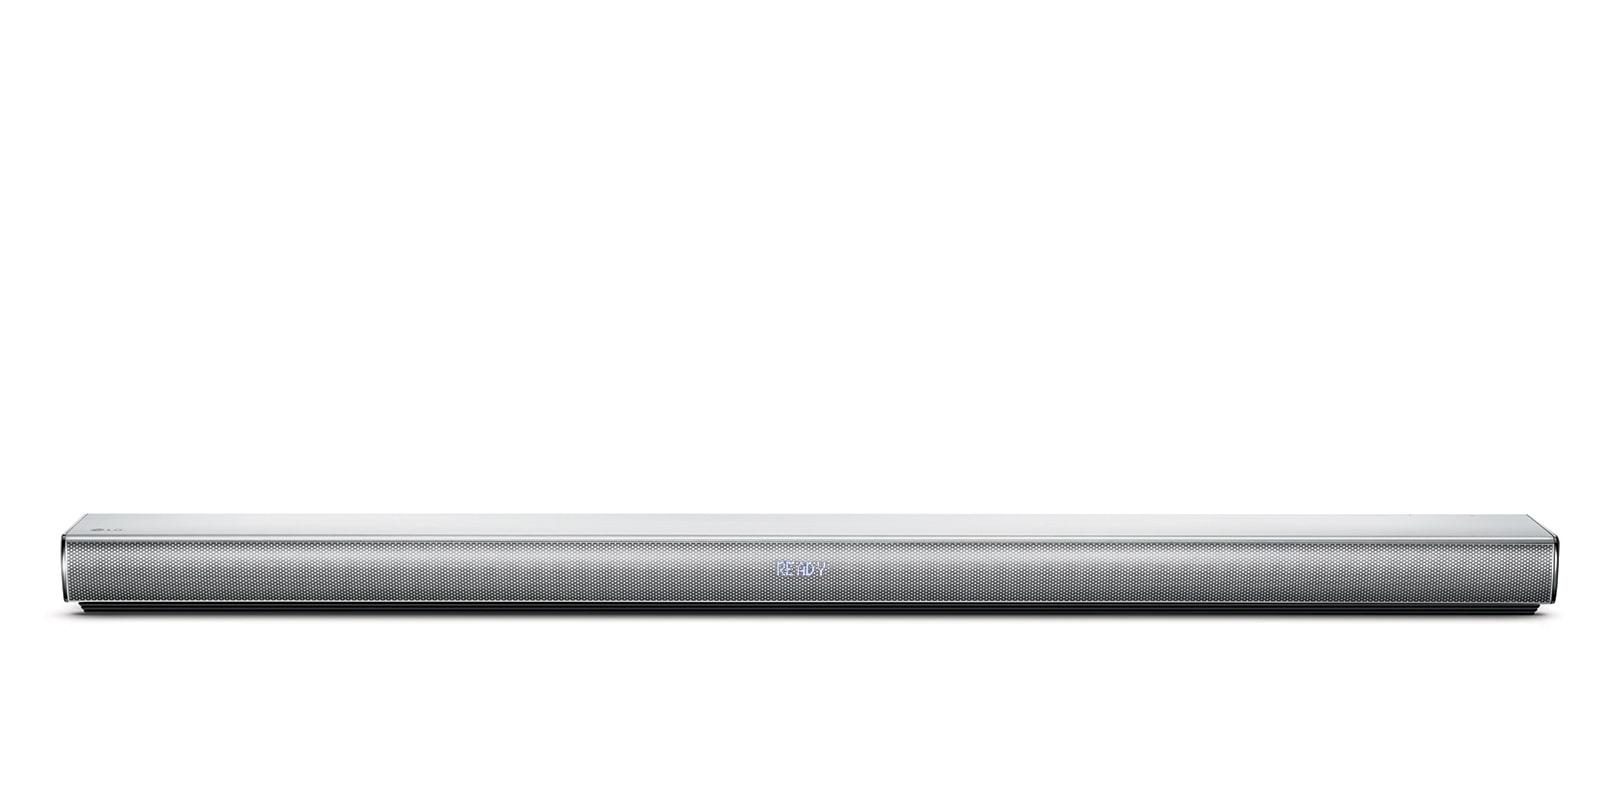 LG 360W 2.1ch Sound Bar with Wireless Subwoofer- MODEL: SH7